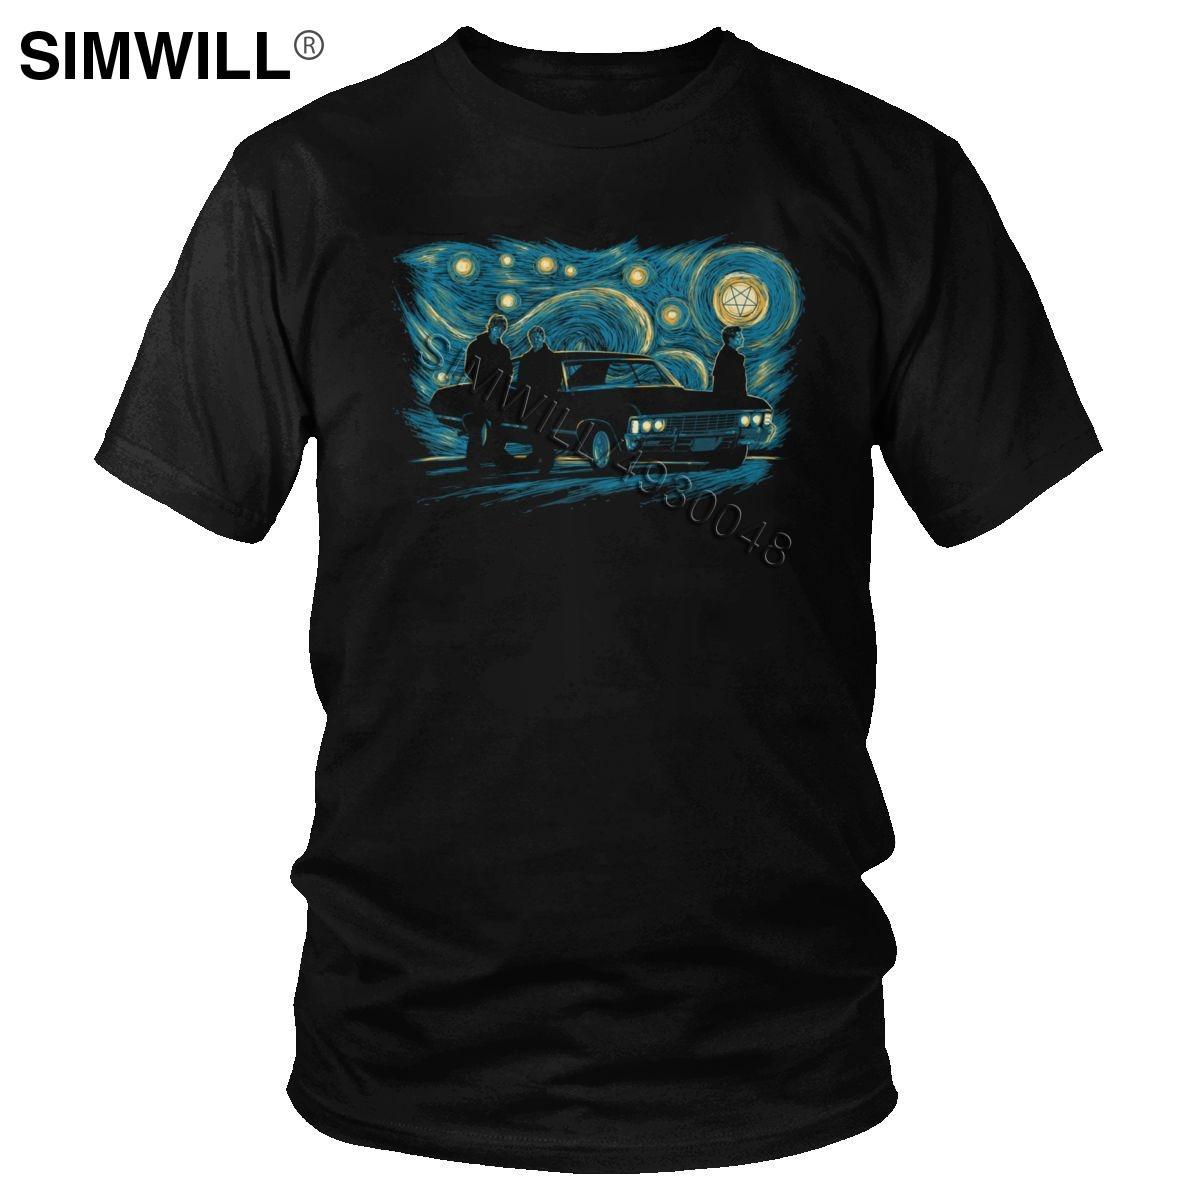 Hommes Starry Night Supernatural T-shirt des hommes Winchester Bros T-shirt manches courtes coton respirant T-shirt Parodie TV T-shirt Habillement